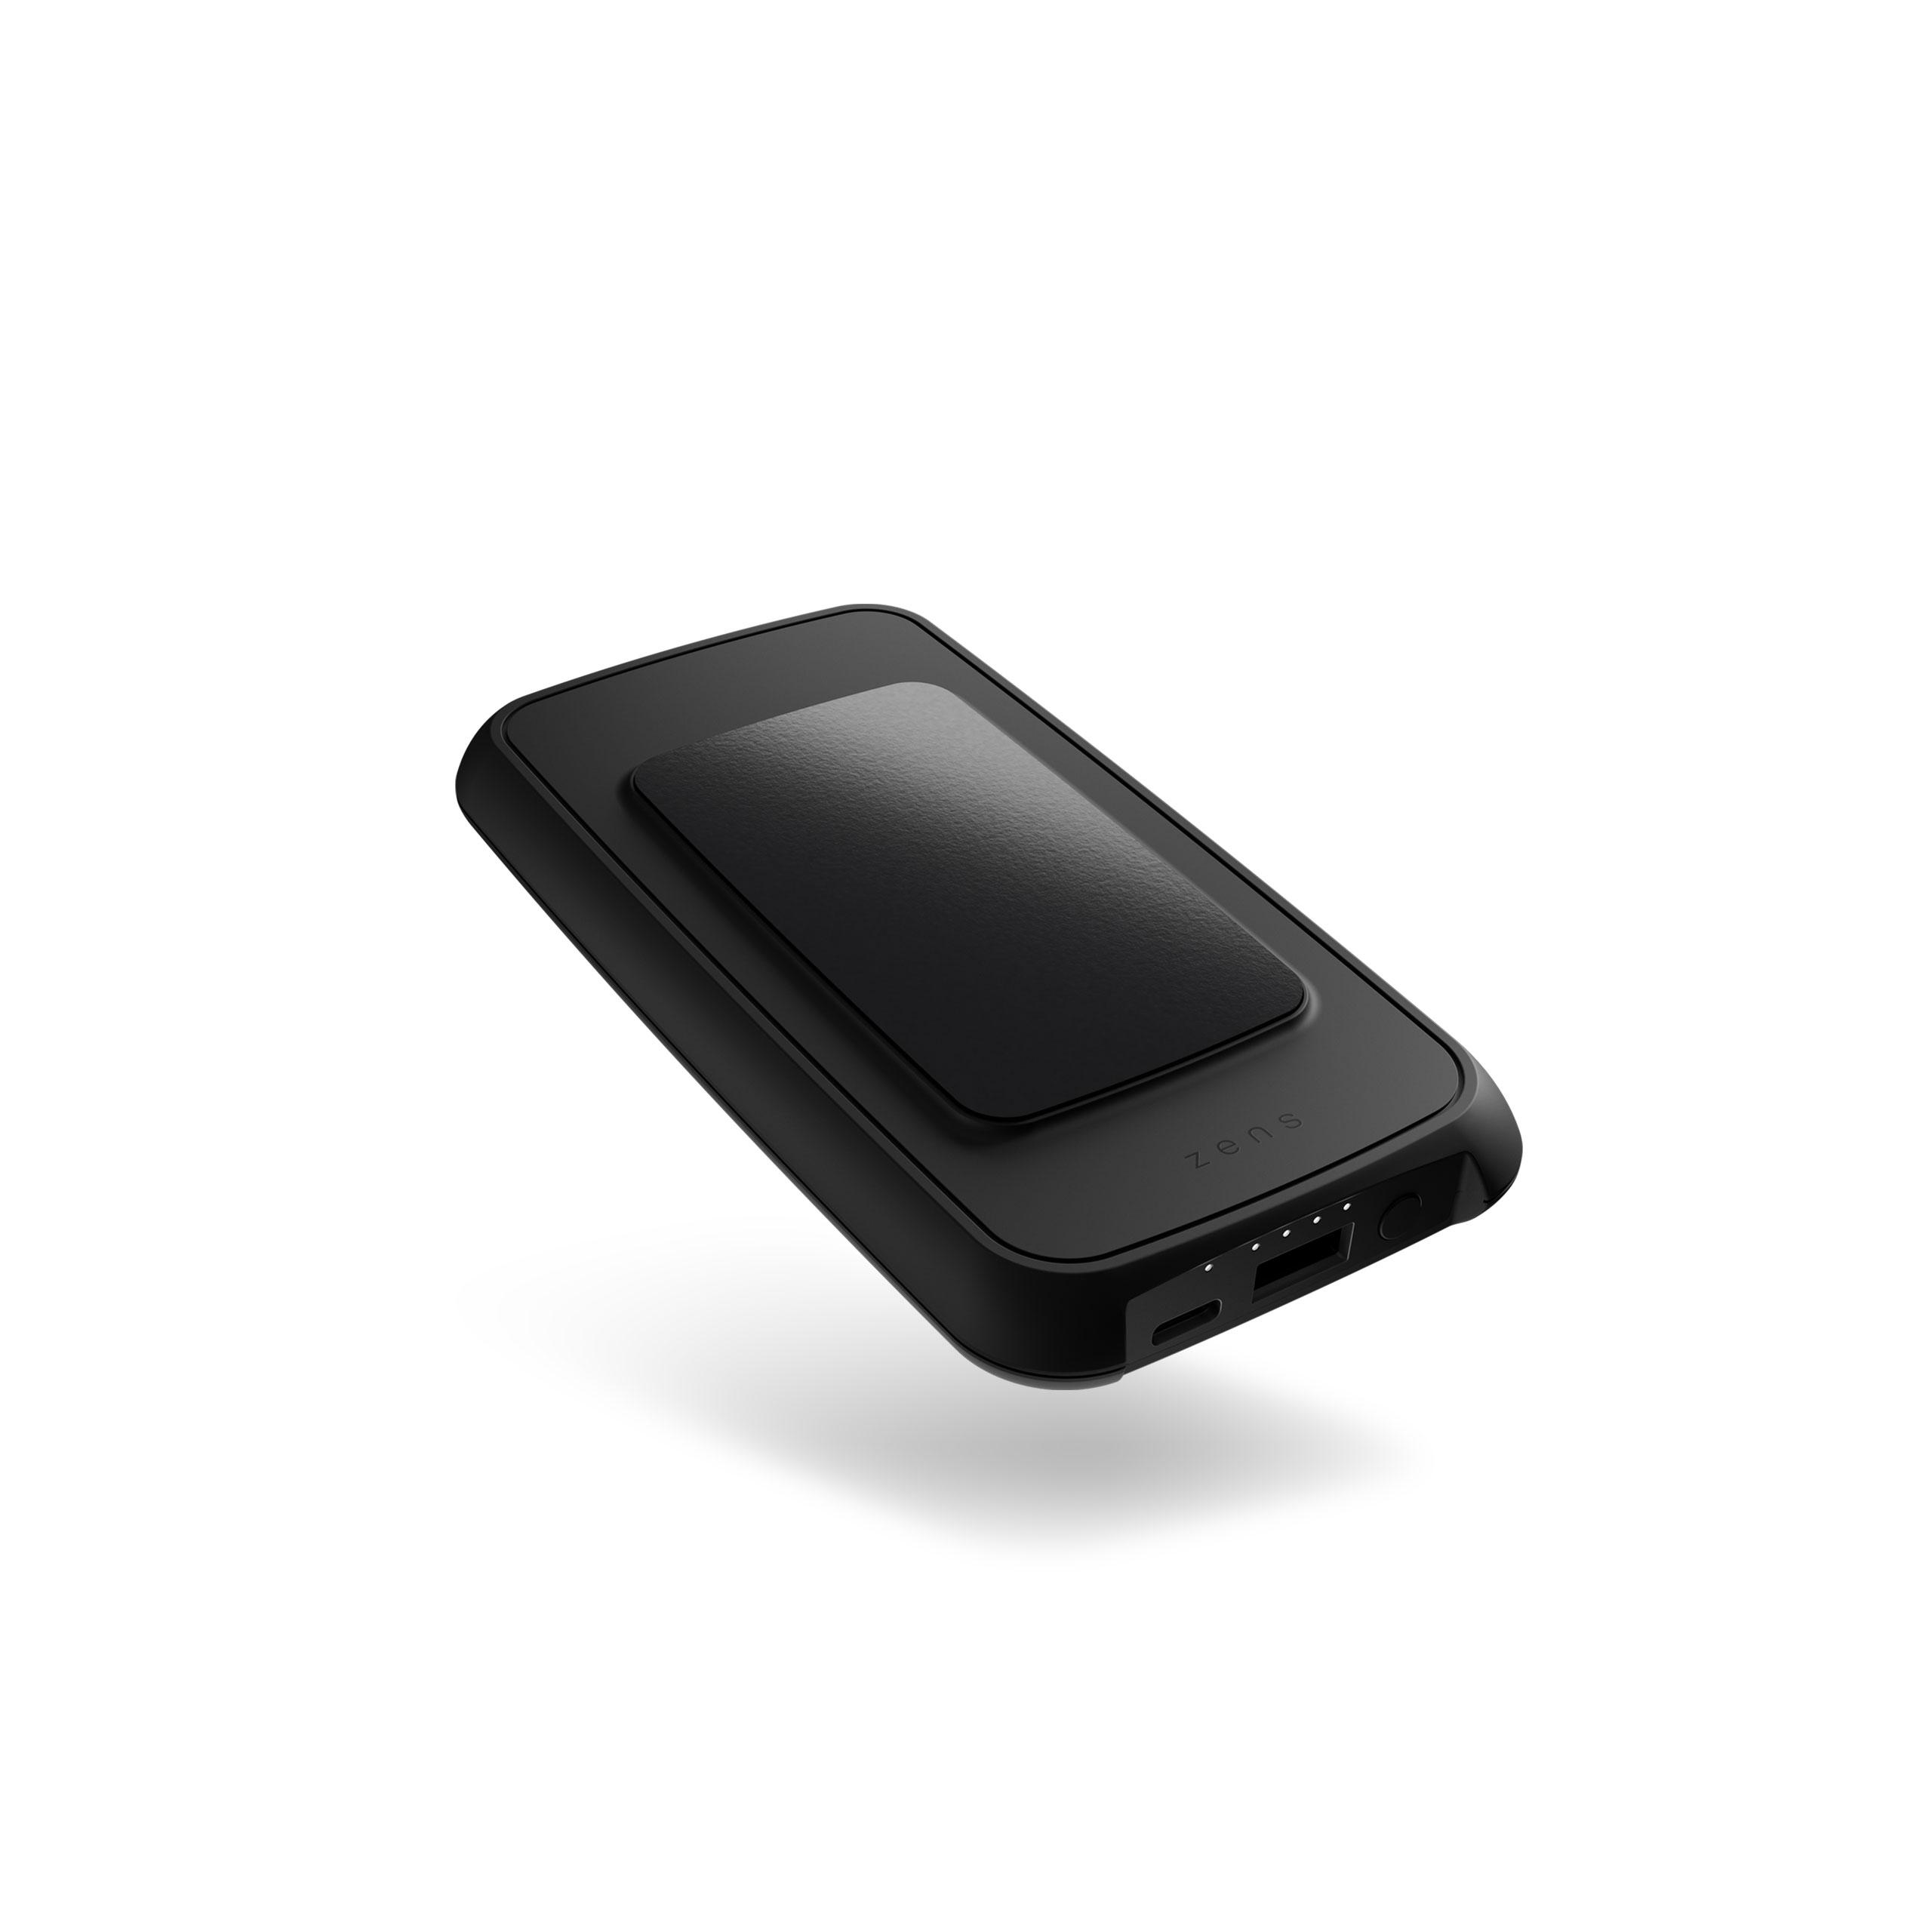 ZEPB03B - Zens Wireless Powerbank with Adhesive Grip Top Side View